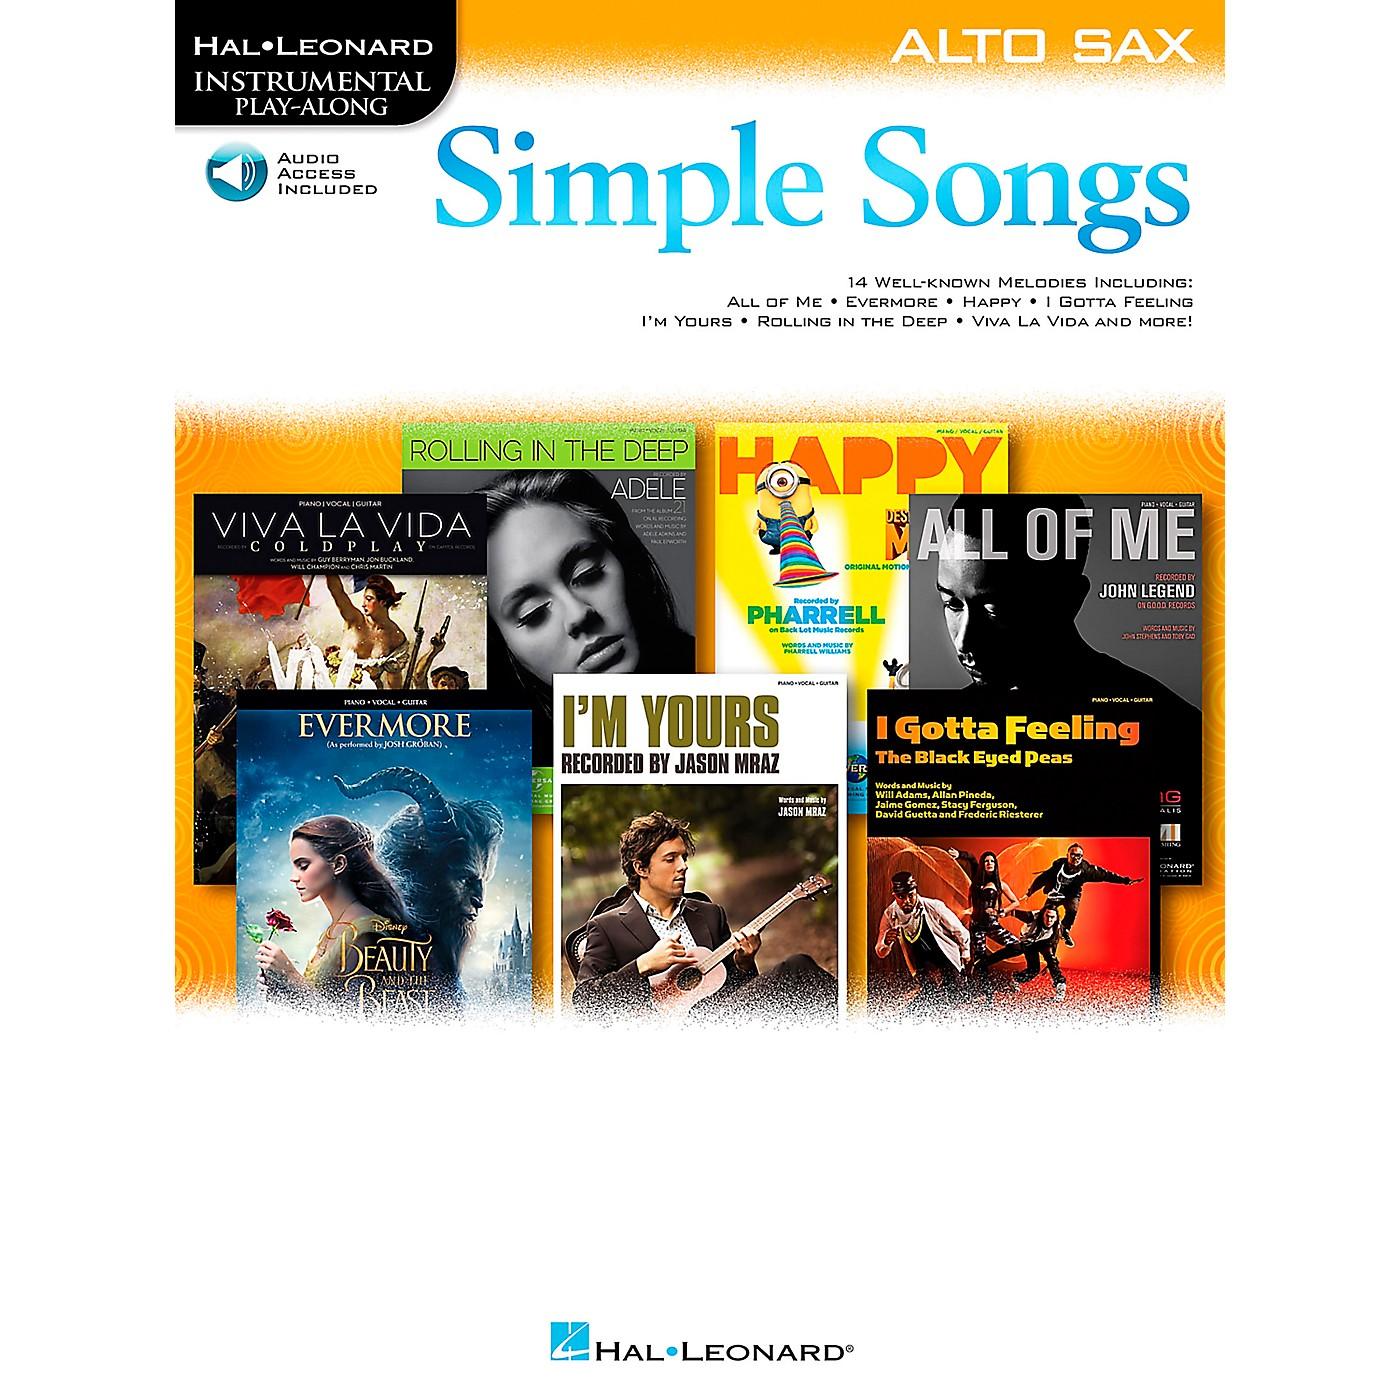 Hal Leonard Simple Songs (Alto Sax) Alto Sax thumbnail